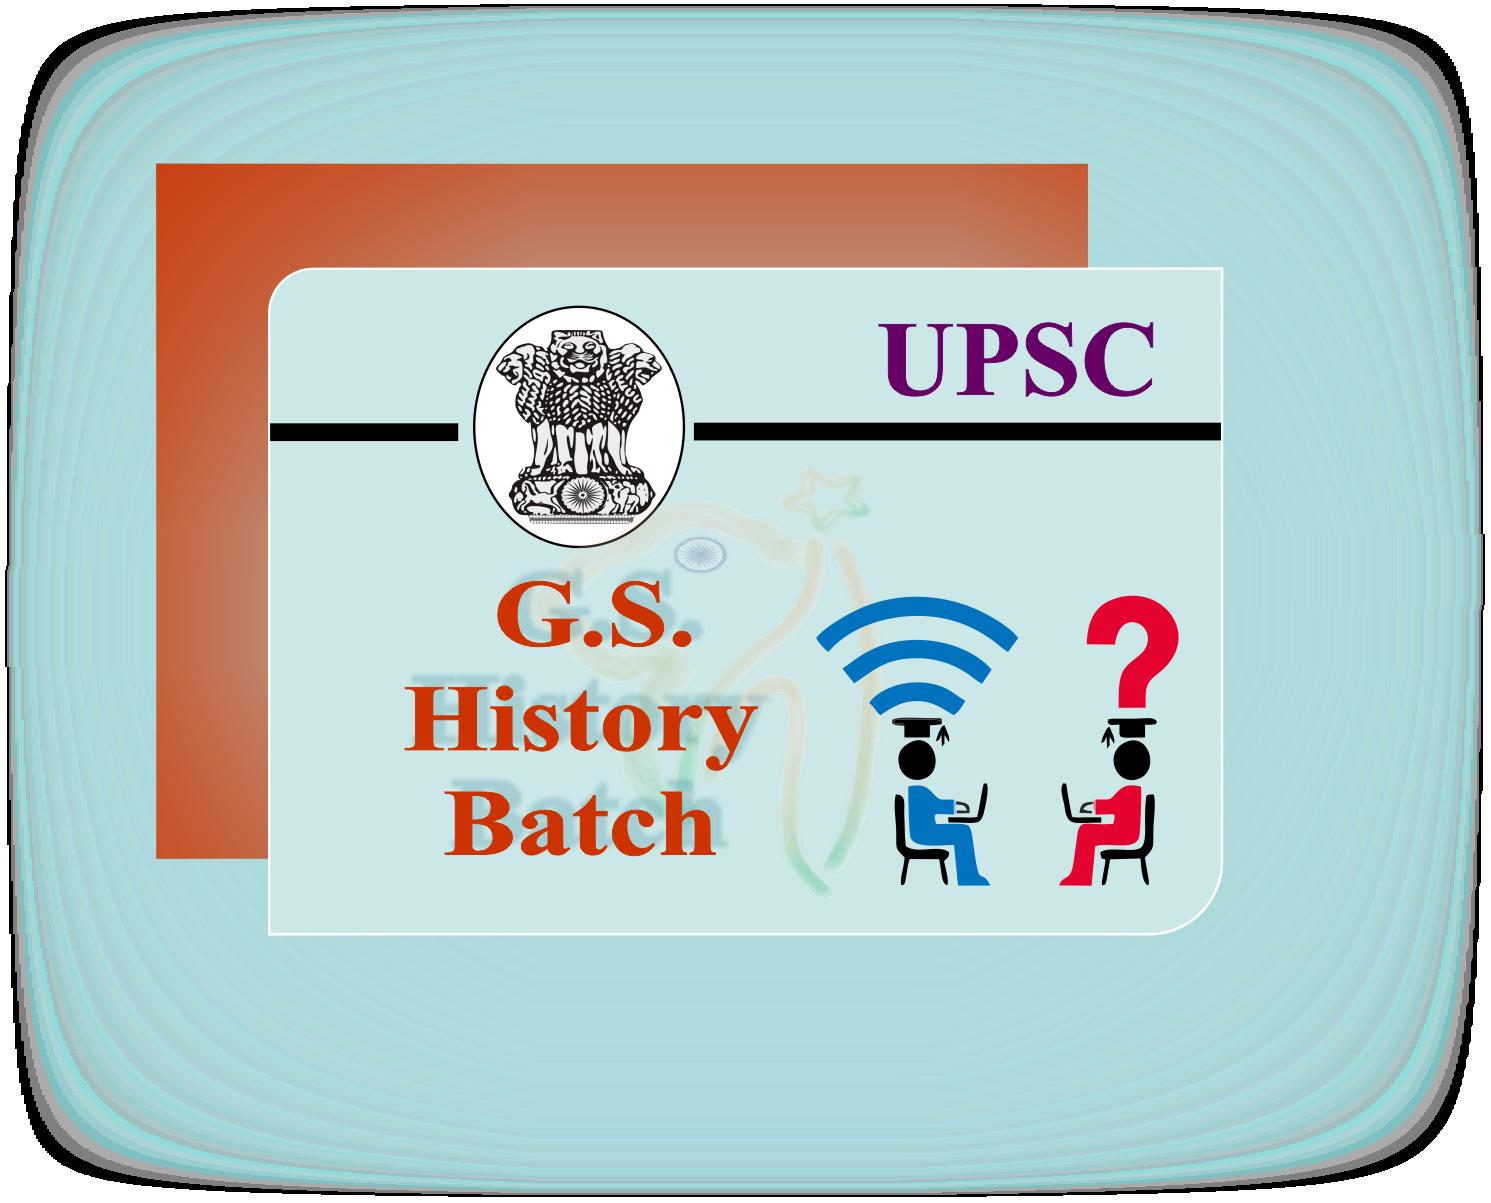 UPSC GS- History Batch